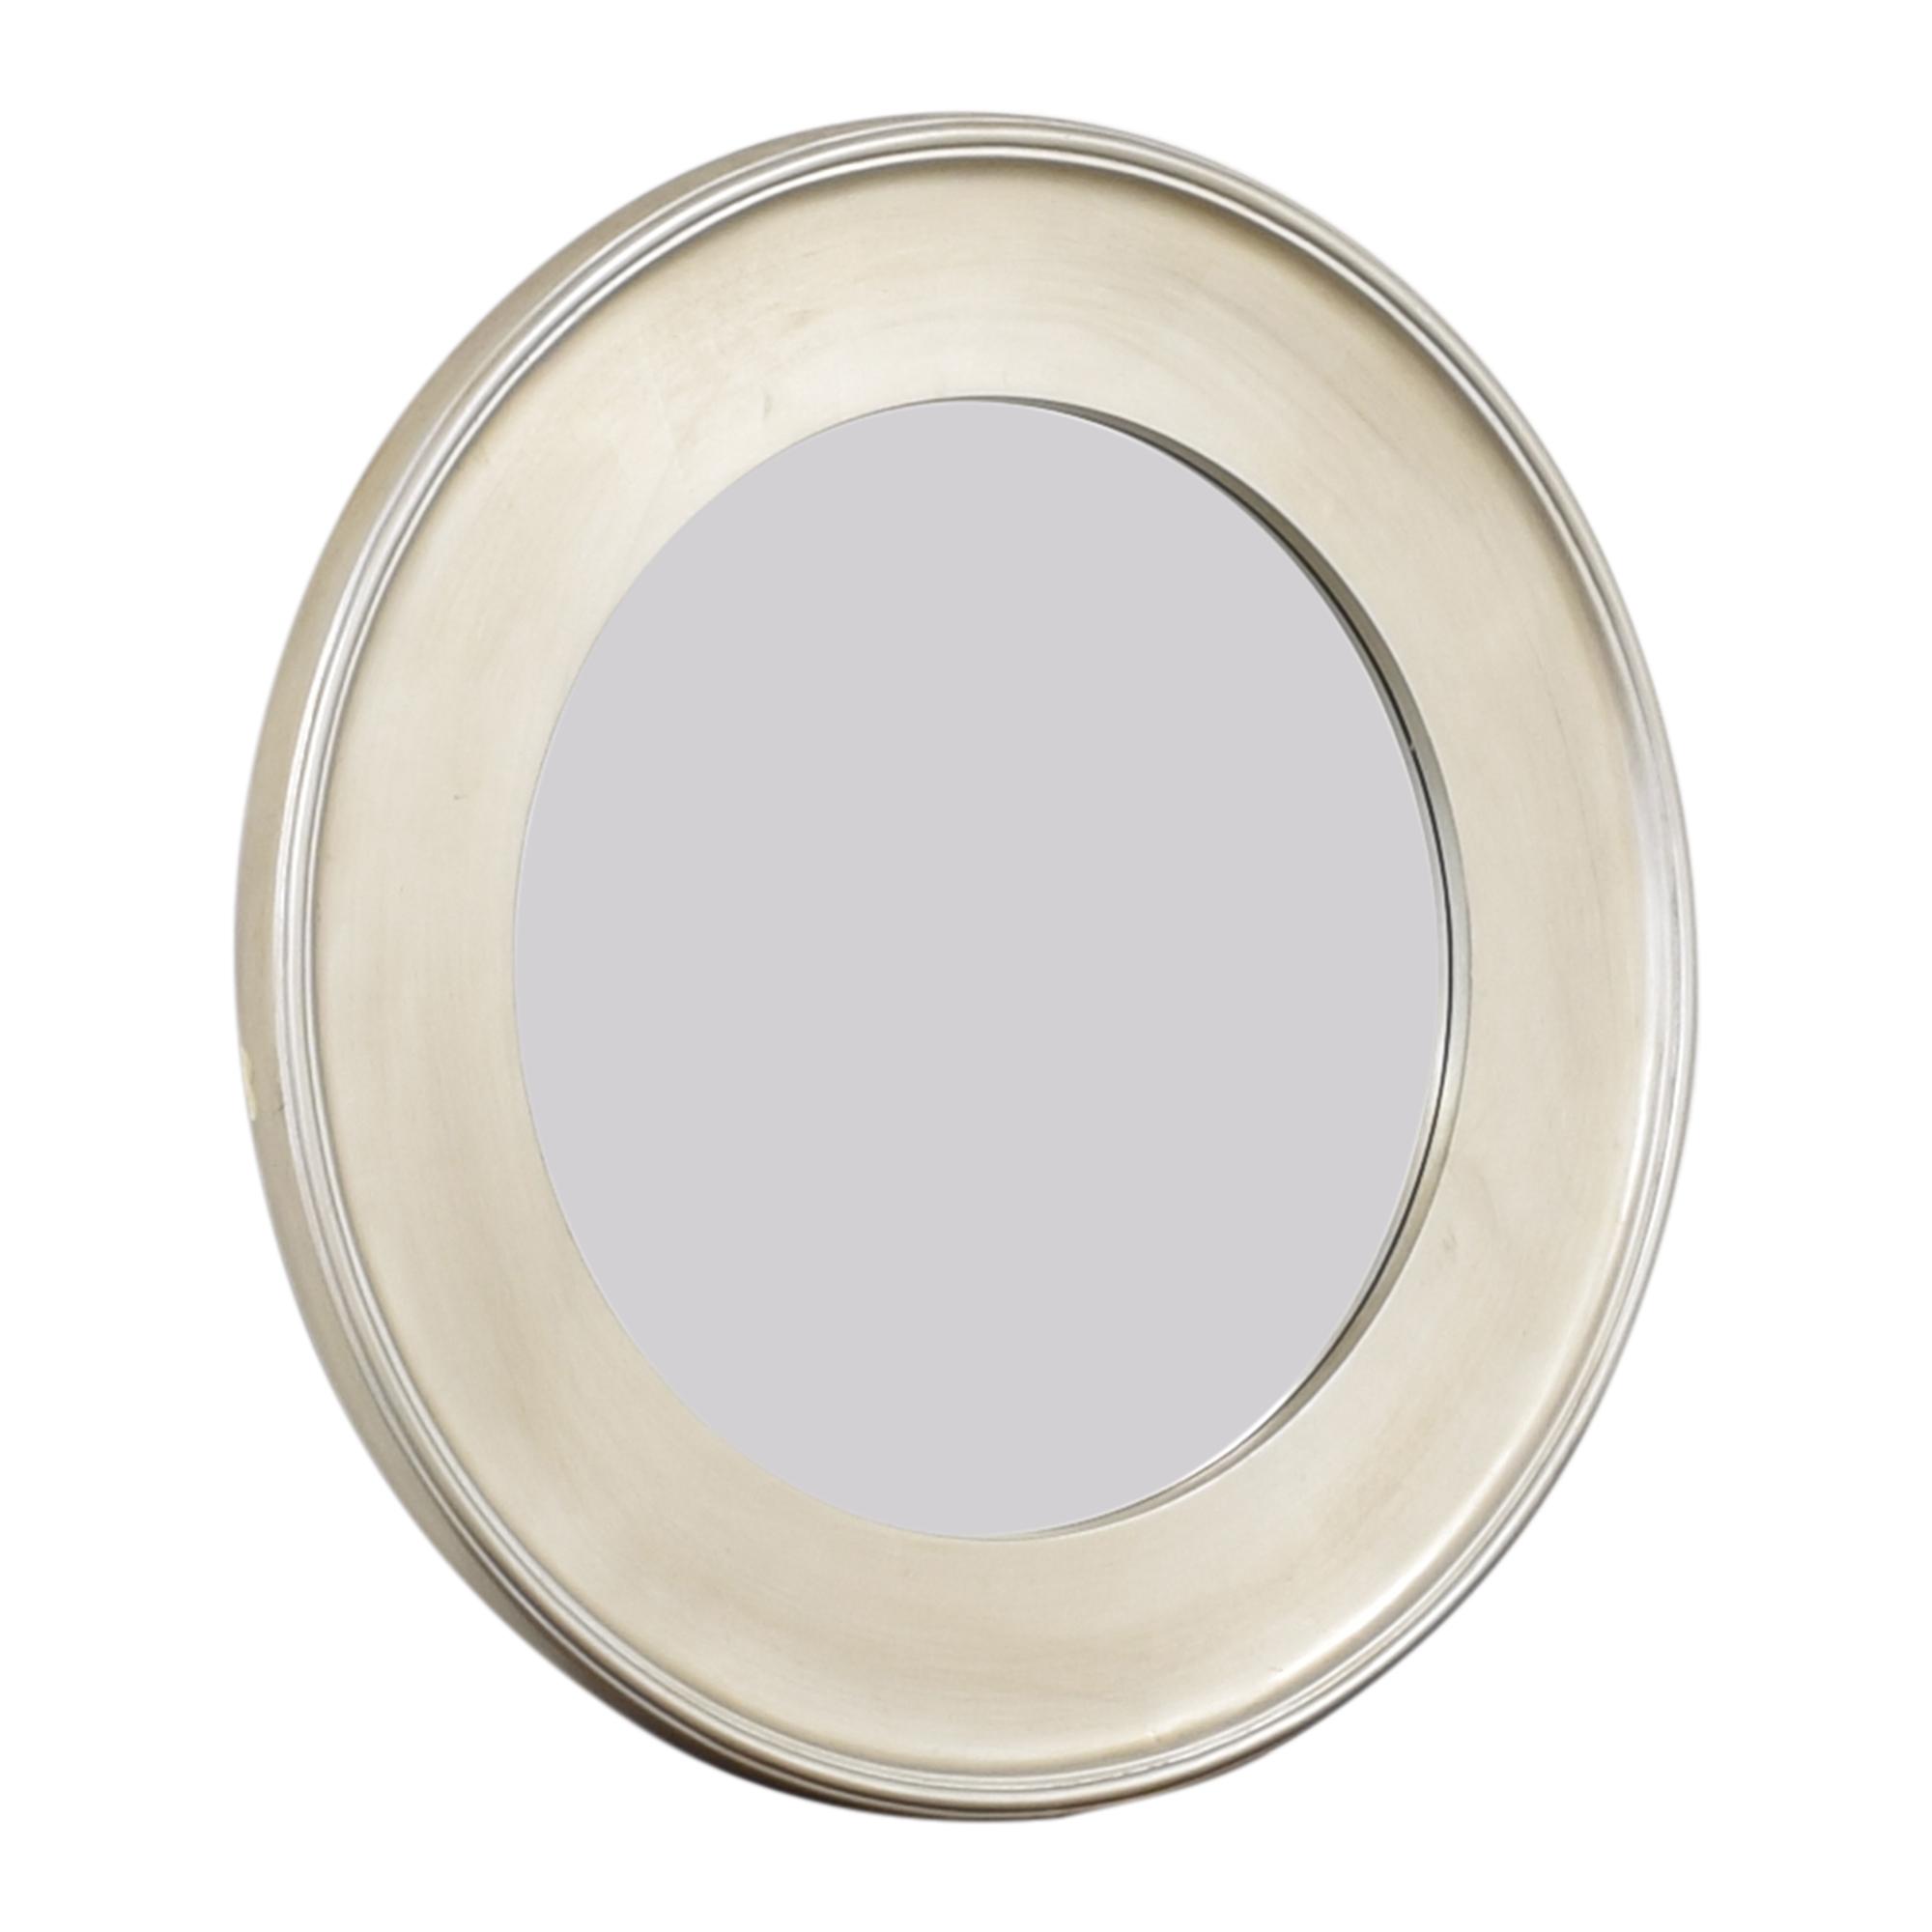 Bassett Mirror Company Basset Mirror Company Ursula Mirror coupon